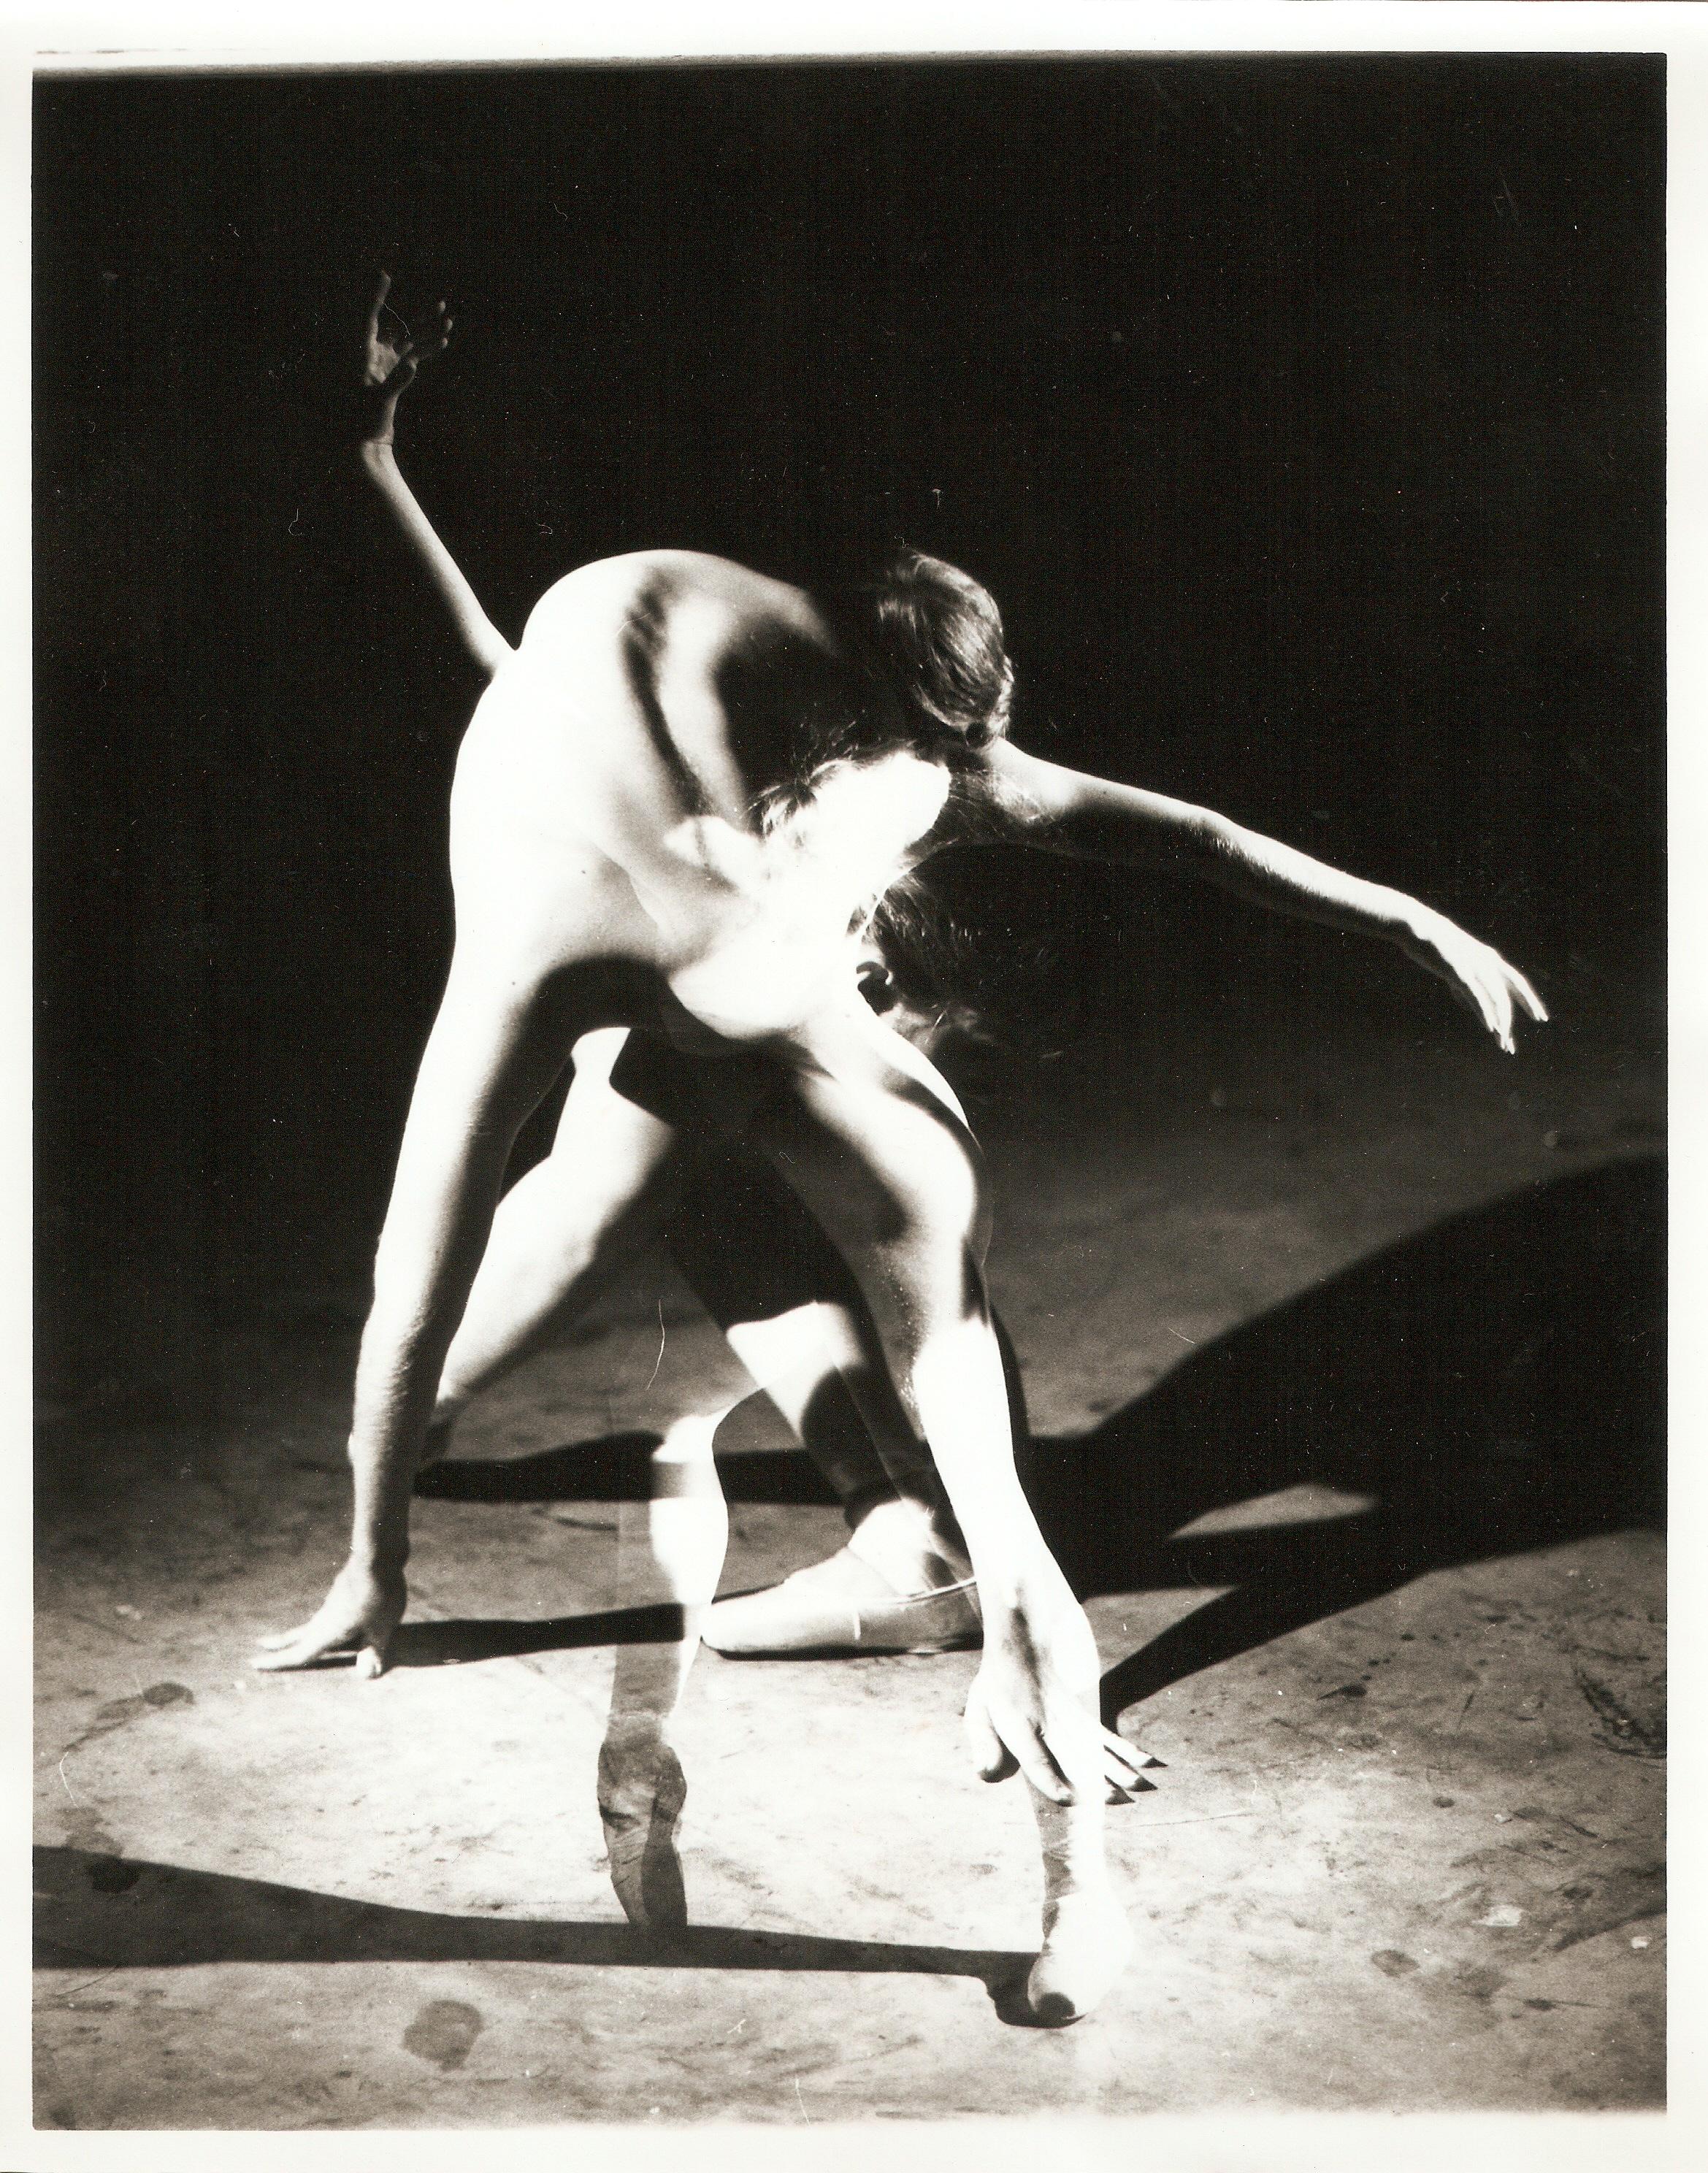 Loren Ellis Ballet model in Fla. Painting Studio 3 of 3 8x10 1979.jpg